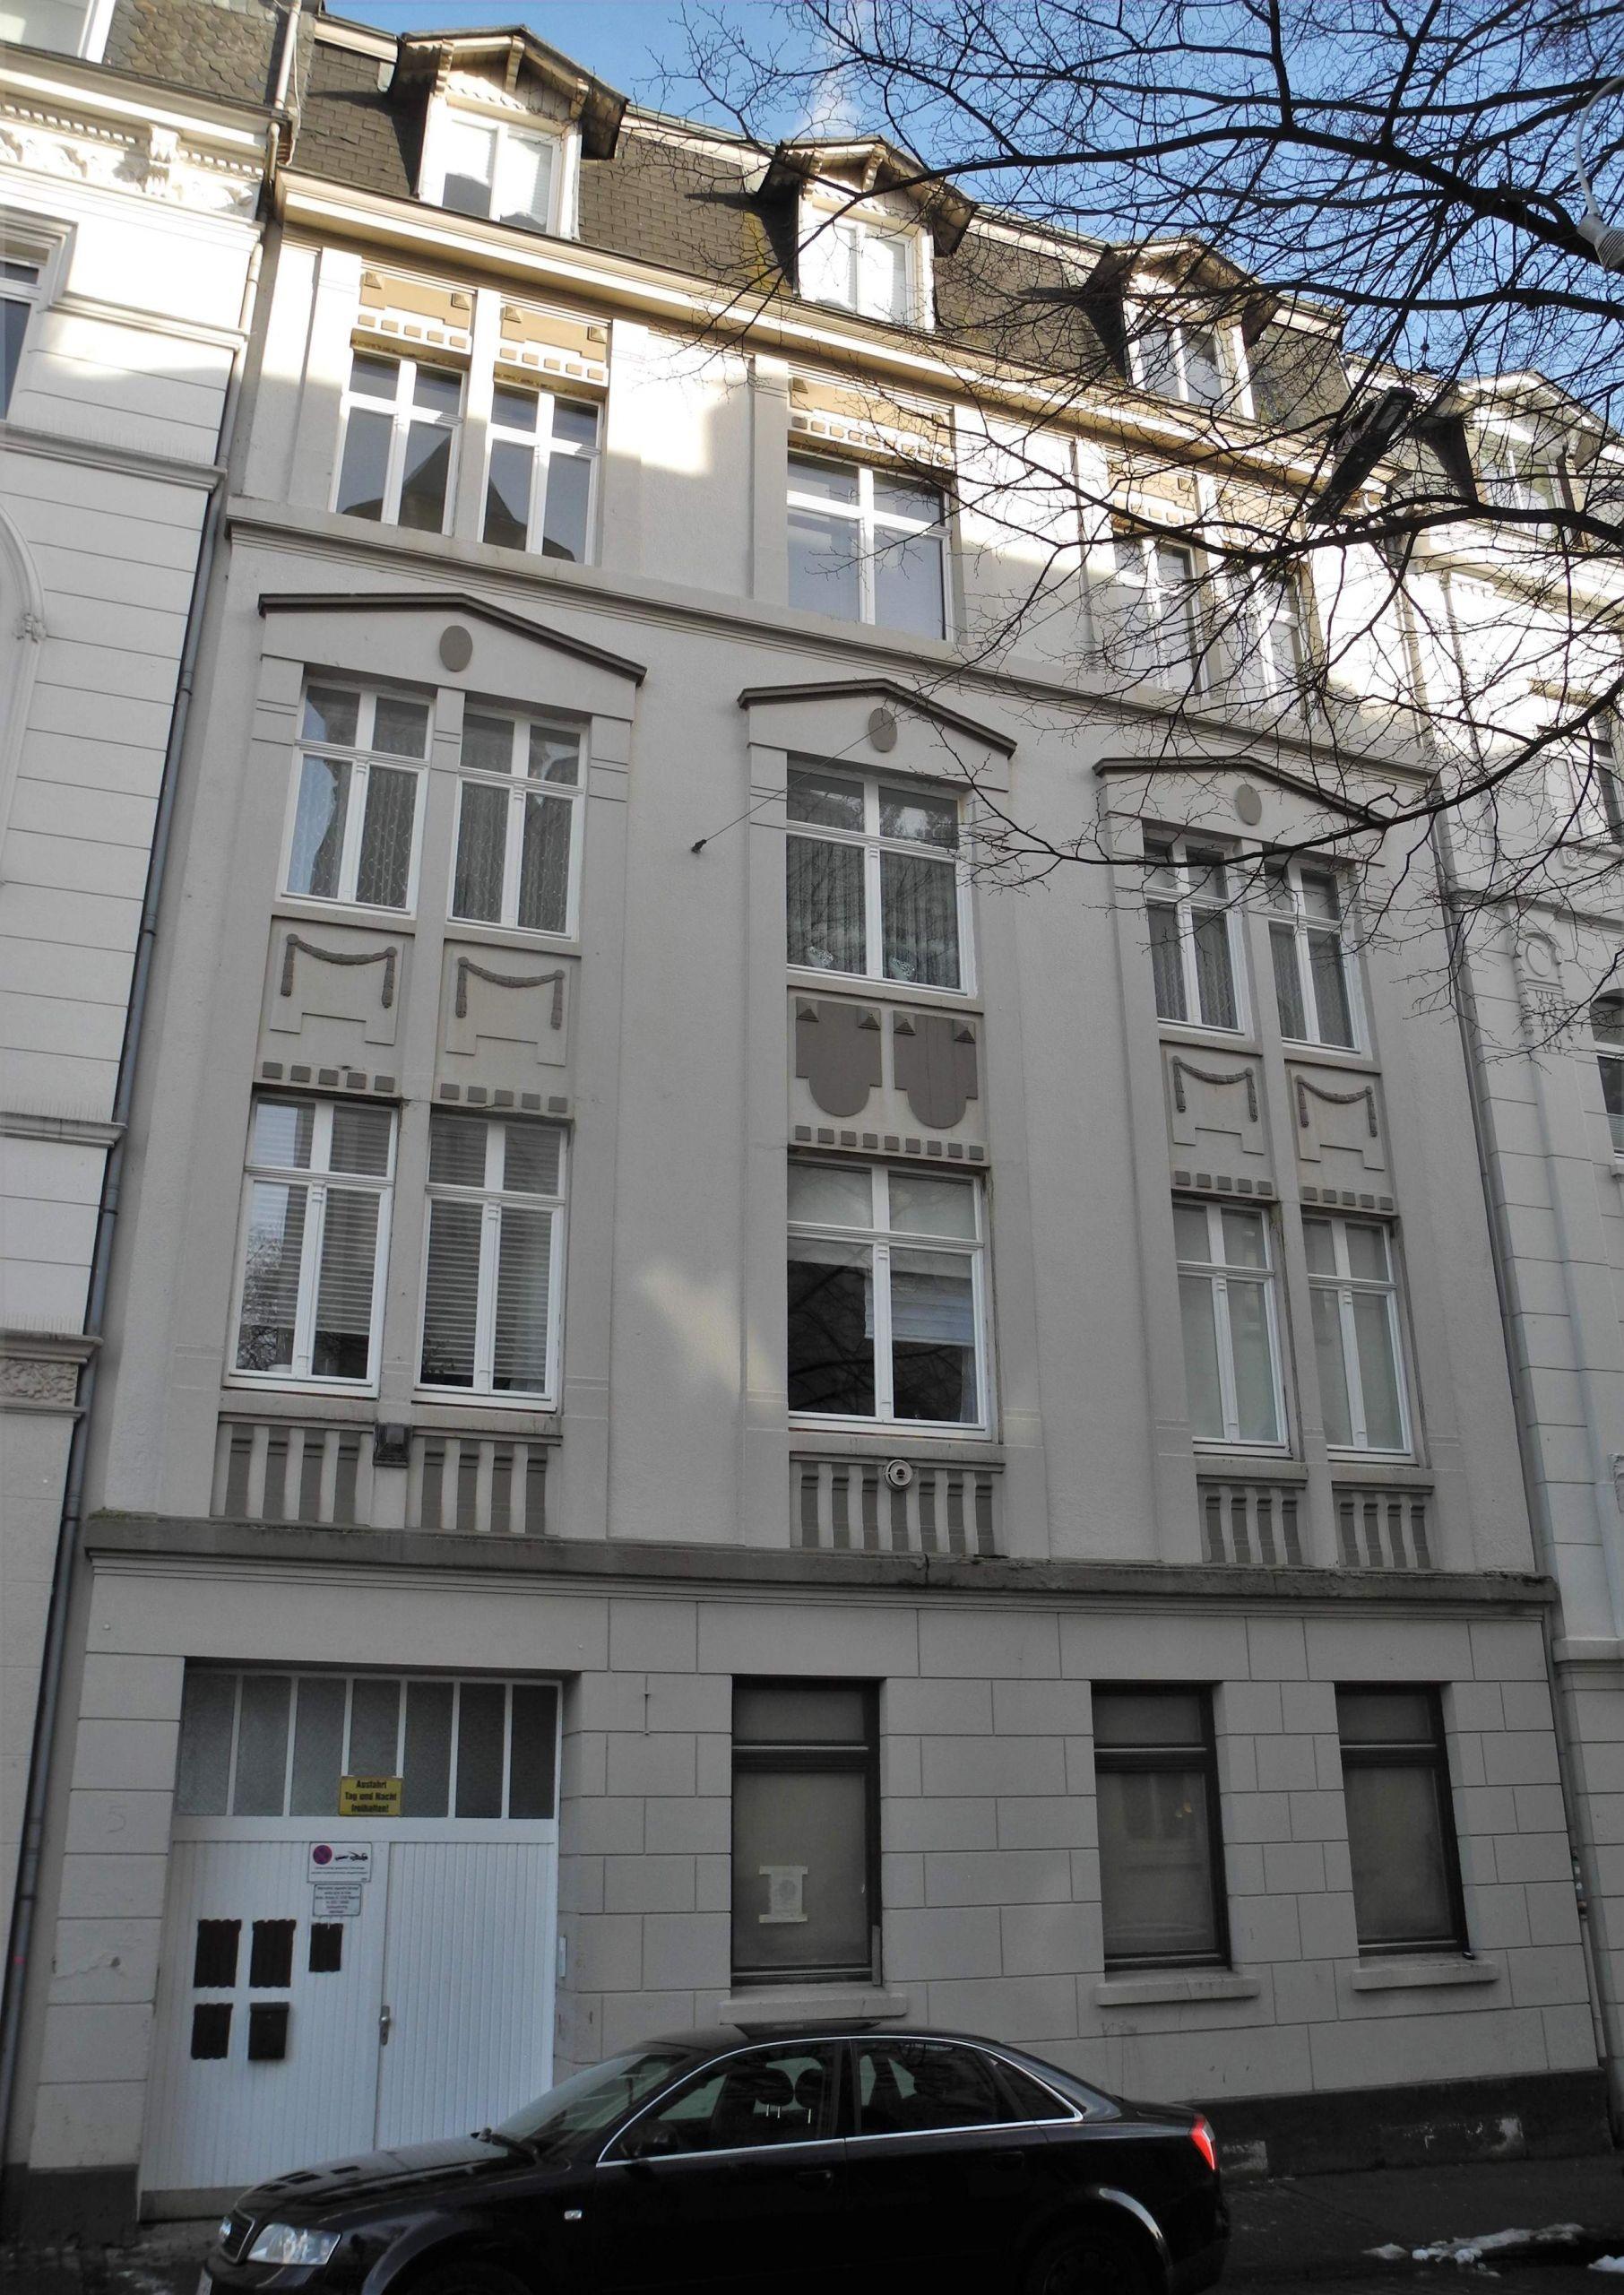 Wuppertal Deweerthstr 5 unbelaubt